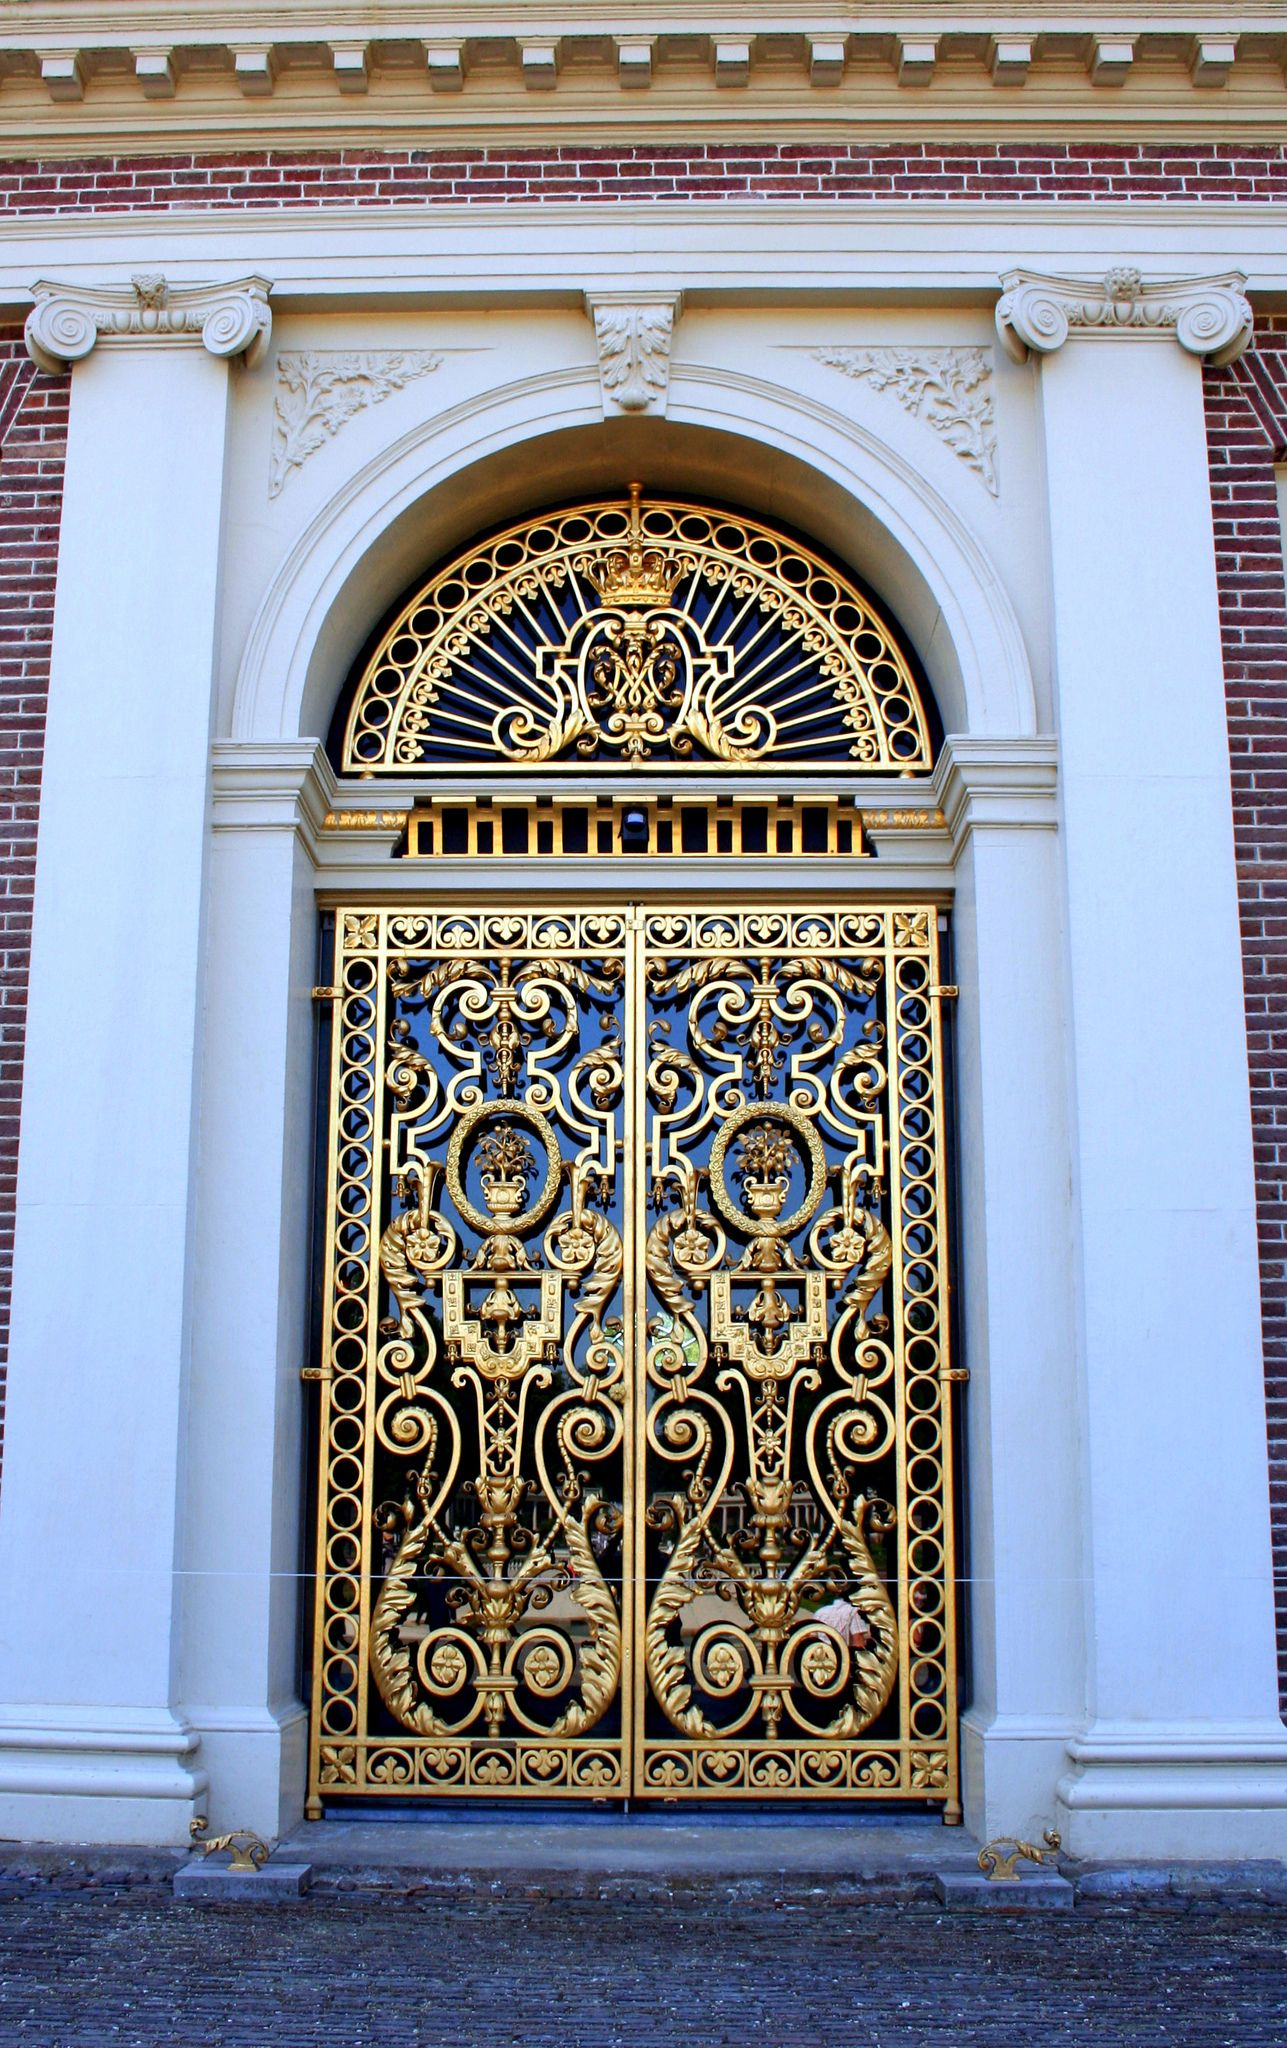 Palace door palace doors and architecture paleis het loo het loo palace door planetlyrics Image collections